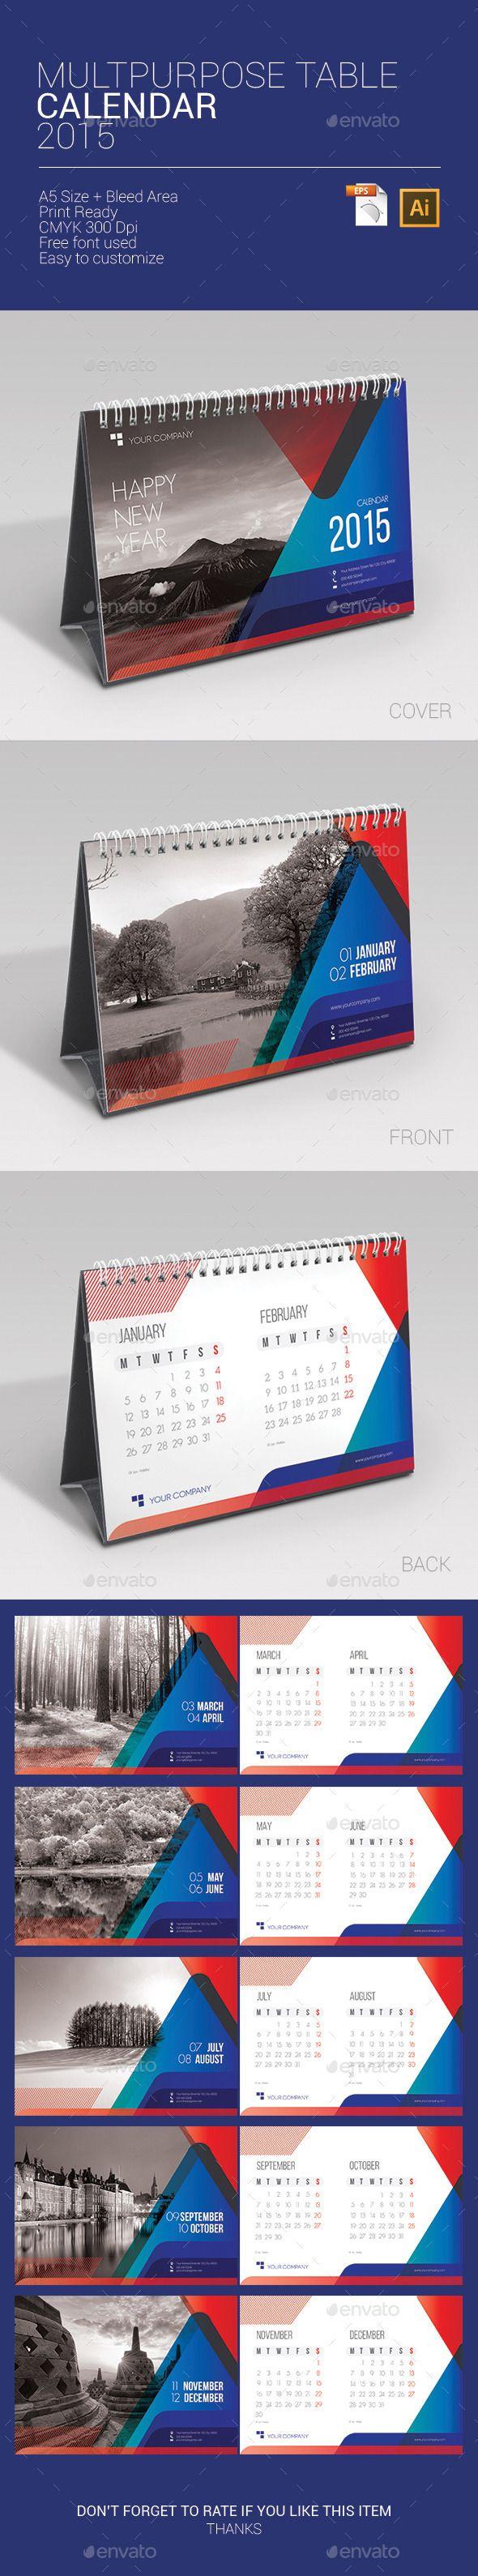 Multipurpose Table Calendar 2014 - Calendars Stationery